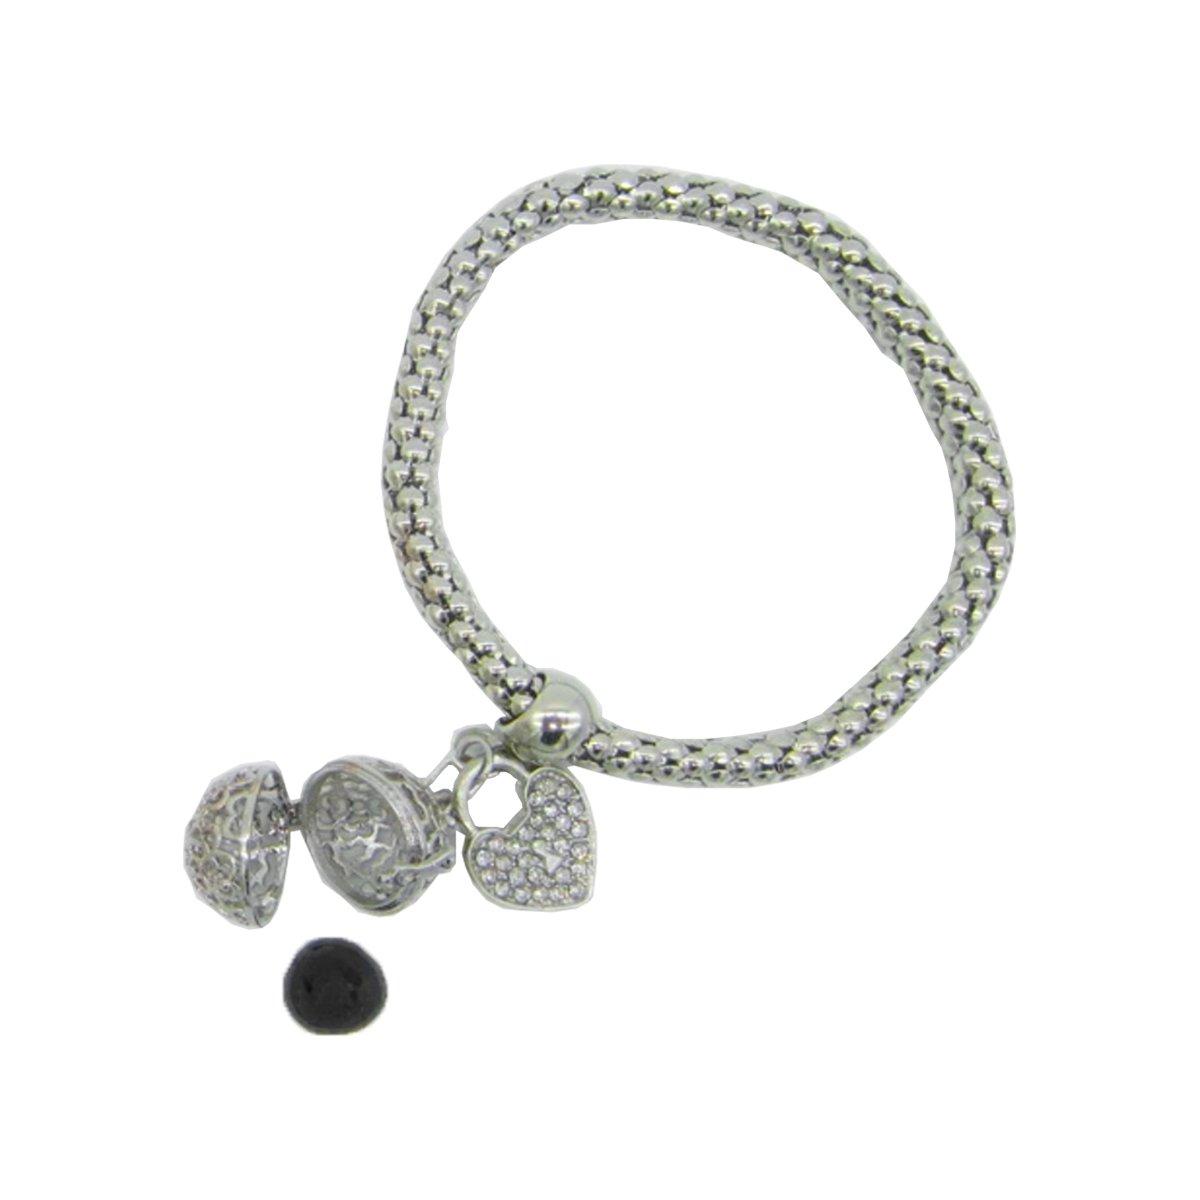 Amazon com: Wearable Scents Silver Charm Diffuser Bracelet w